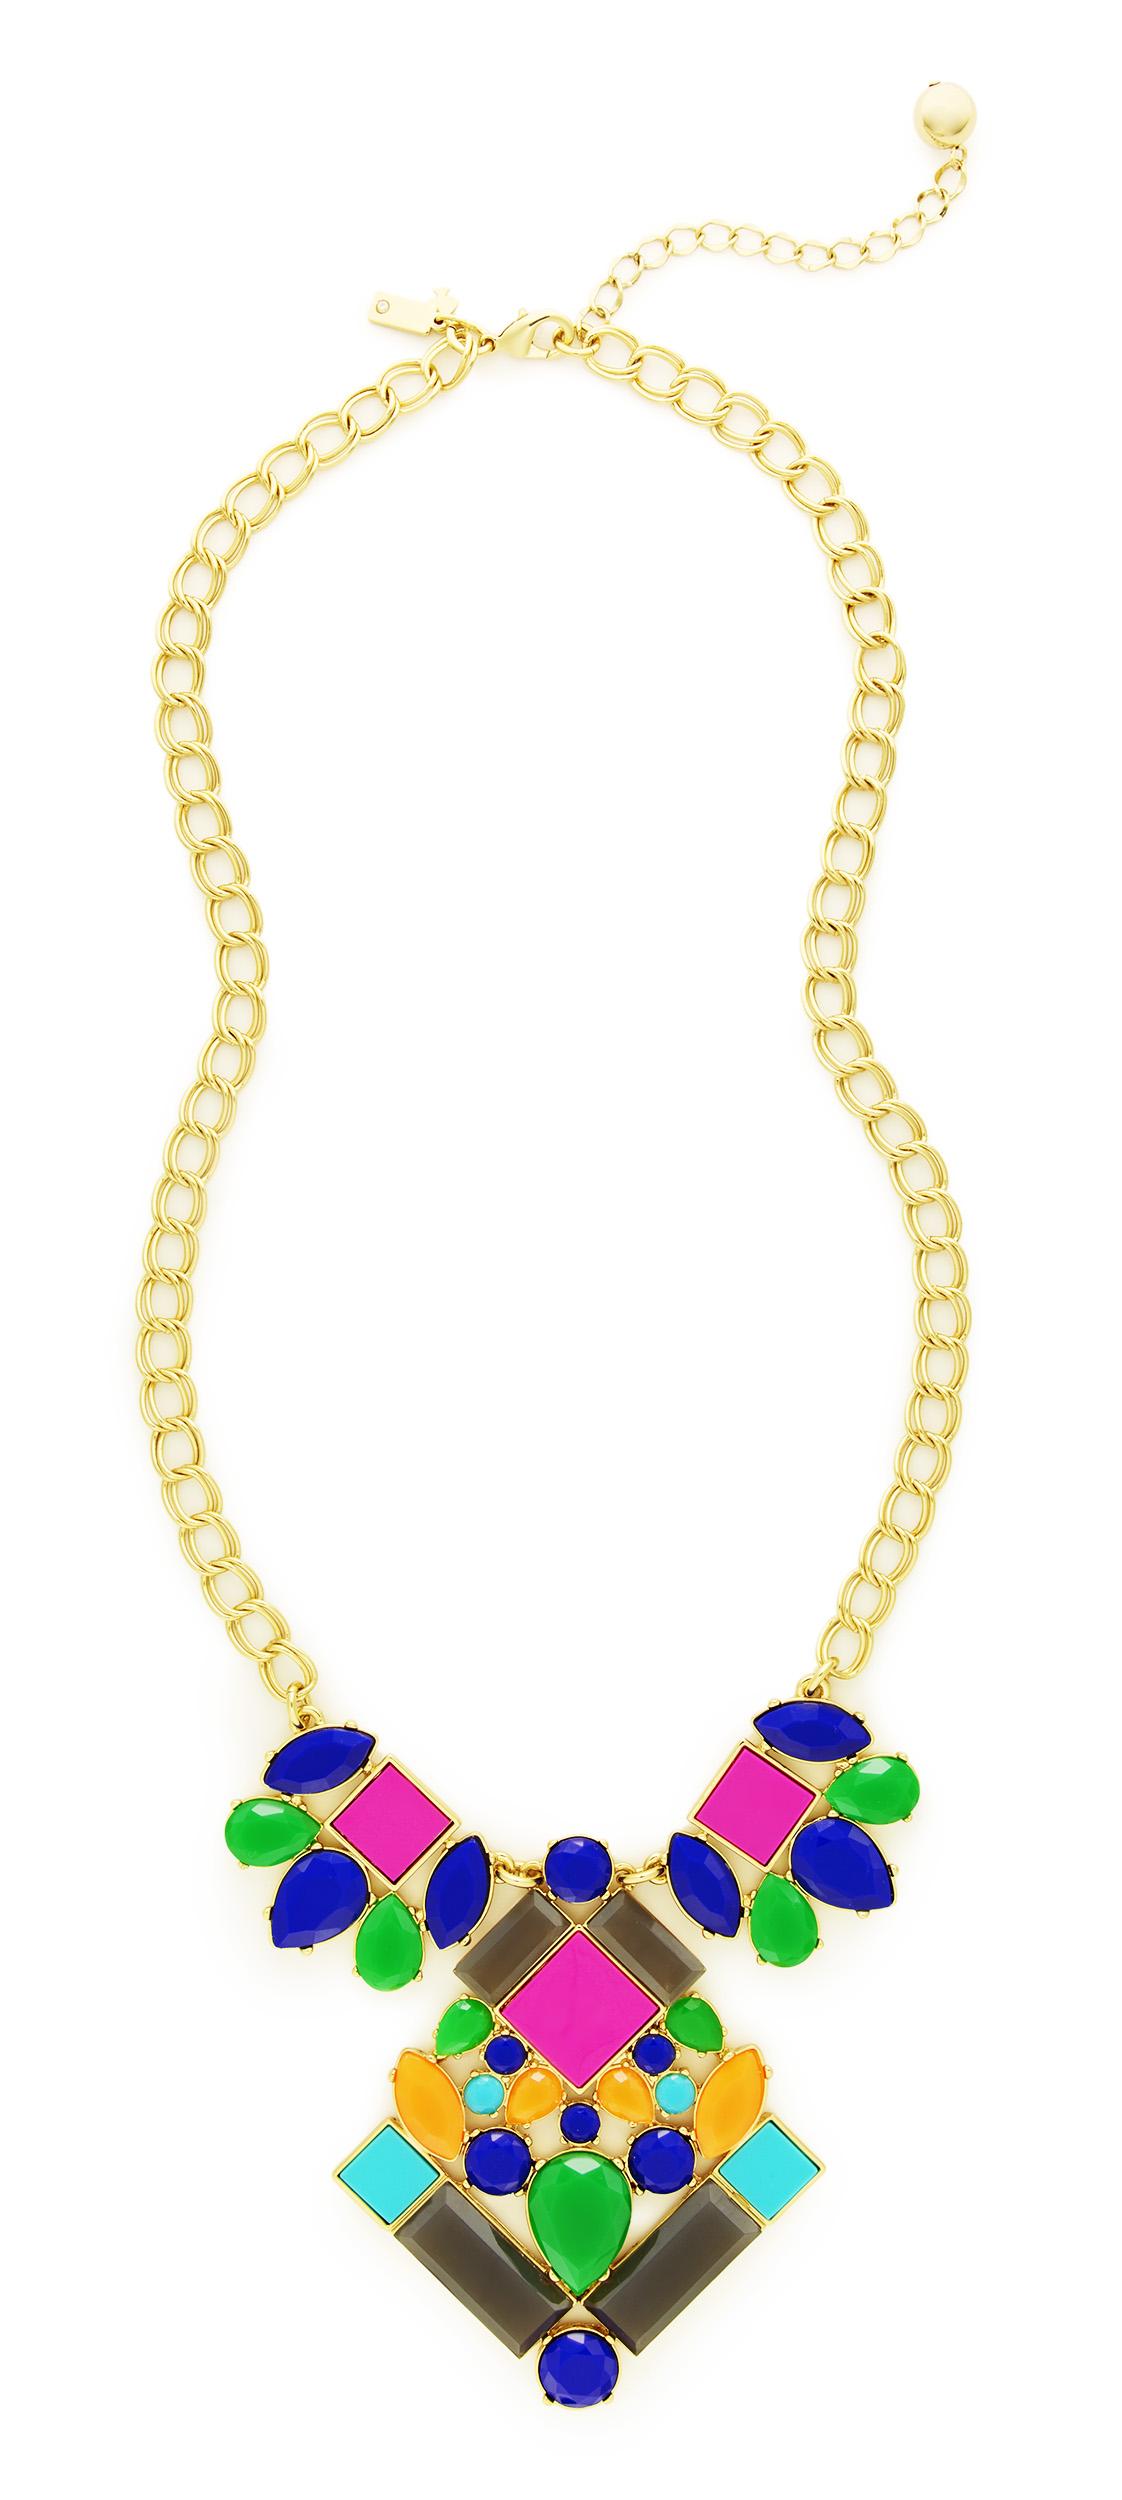 necklace-2.jpg